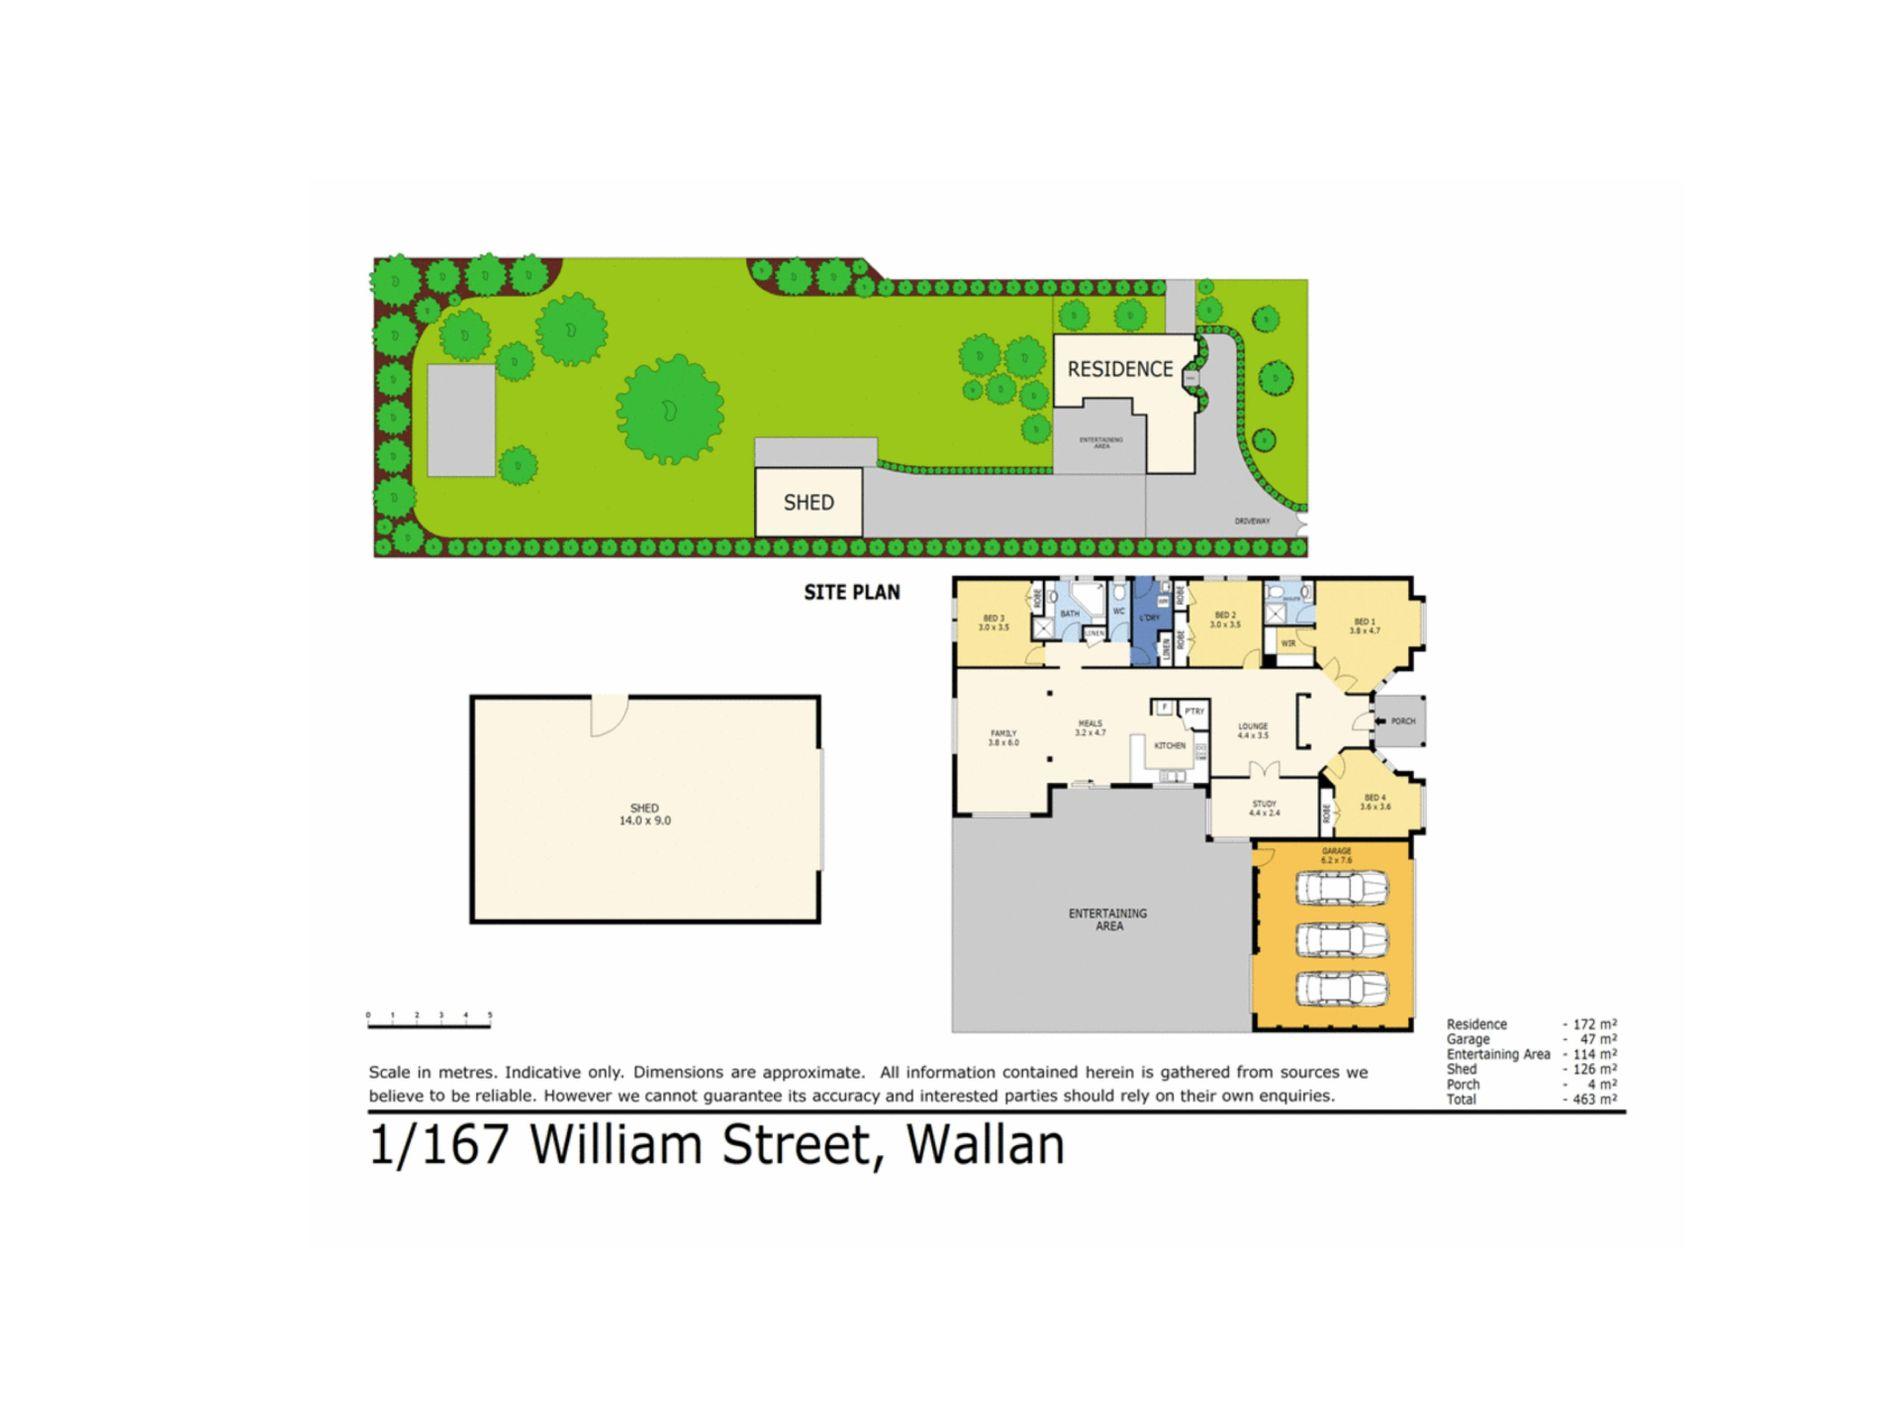 1 / 167 WILLIAM STREET, Wallan